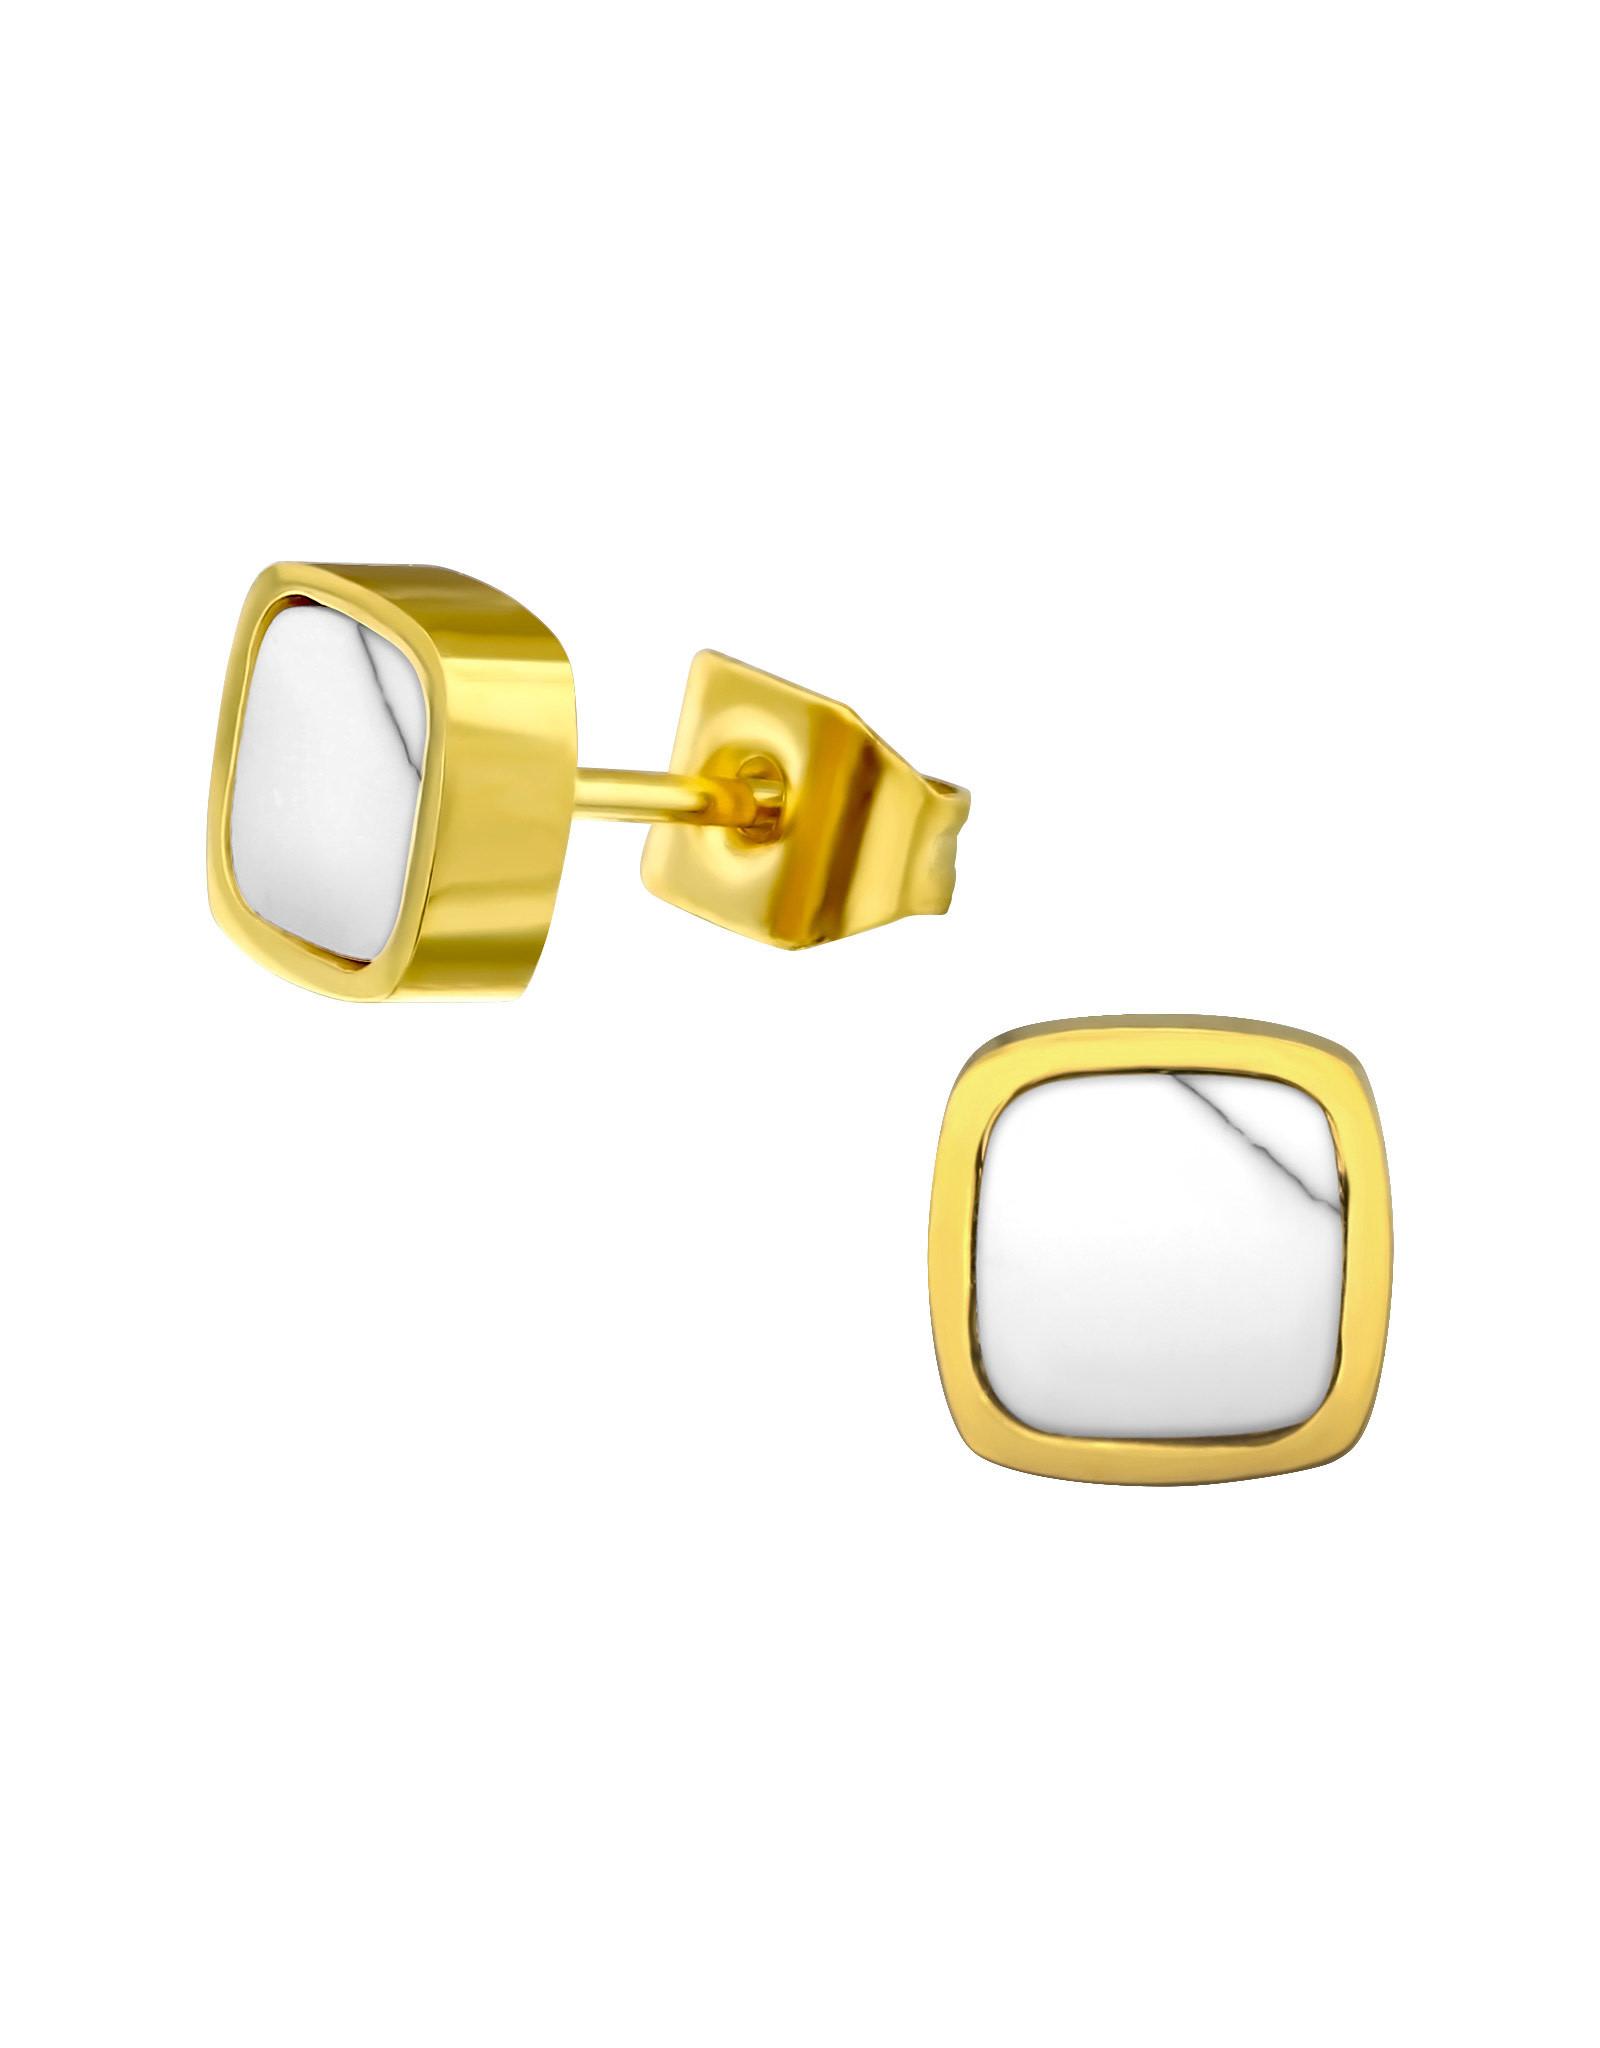 Stekertjes vierkant marmer goudkleurig